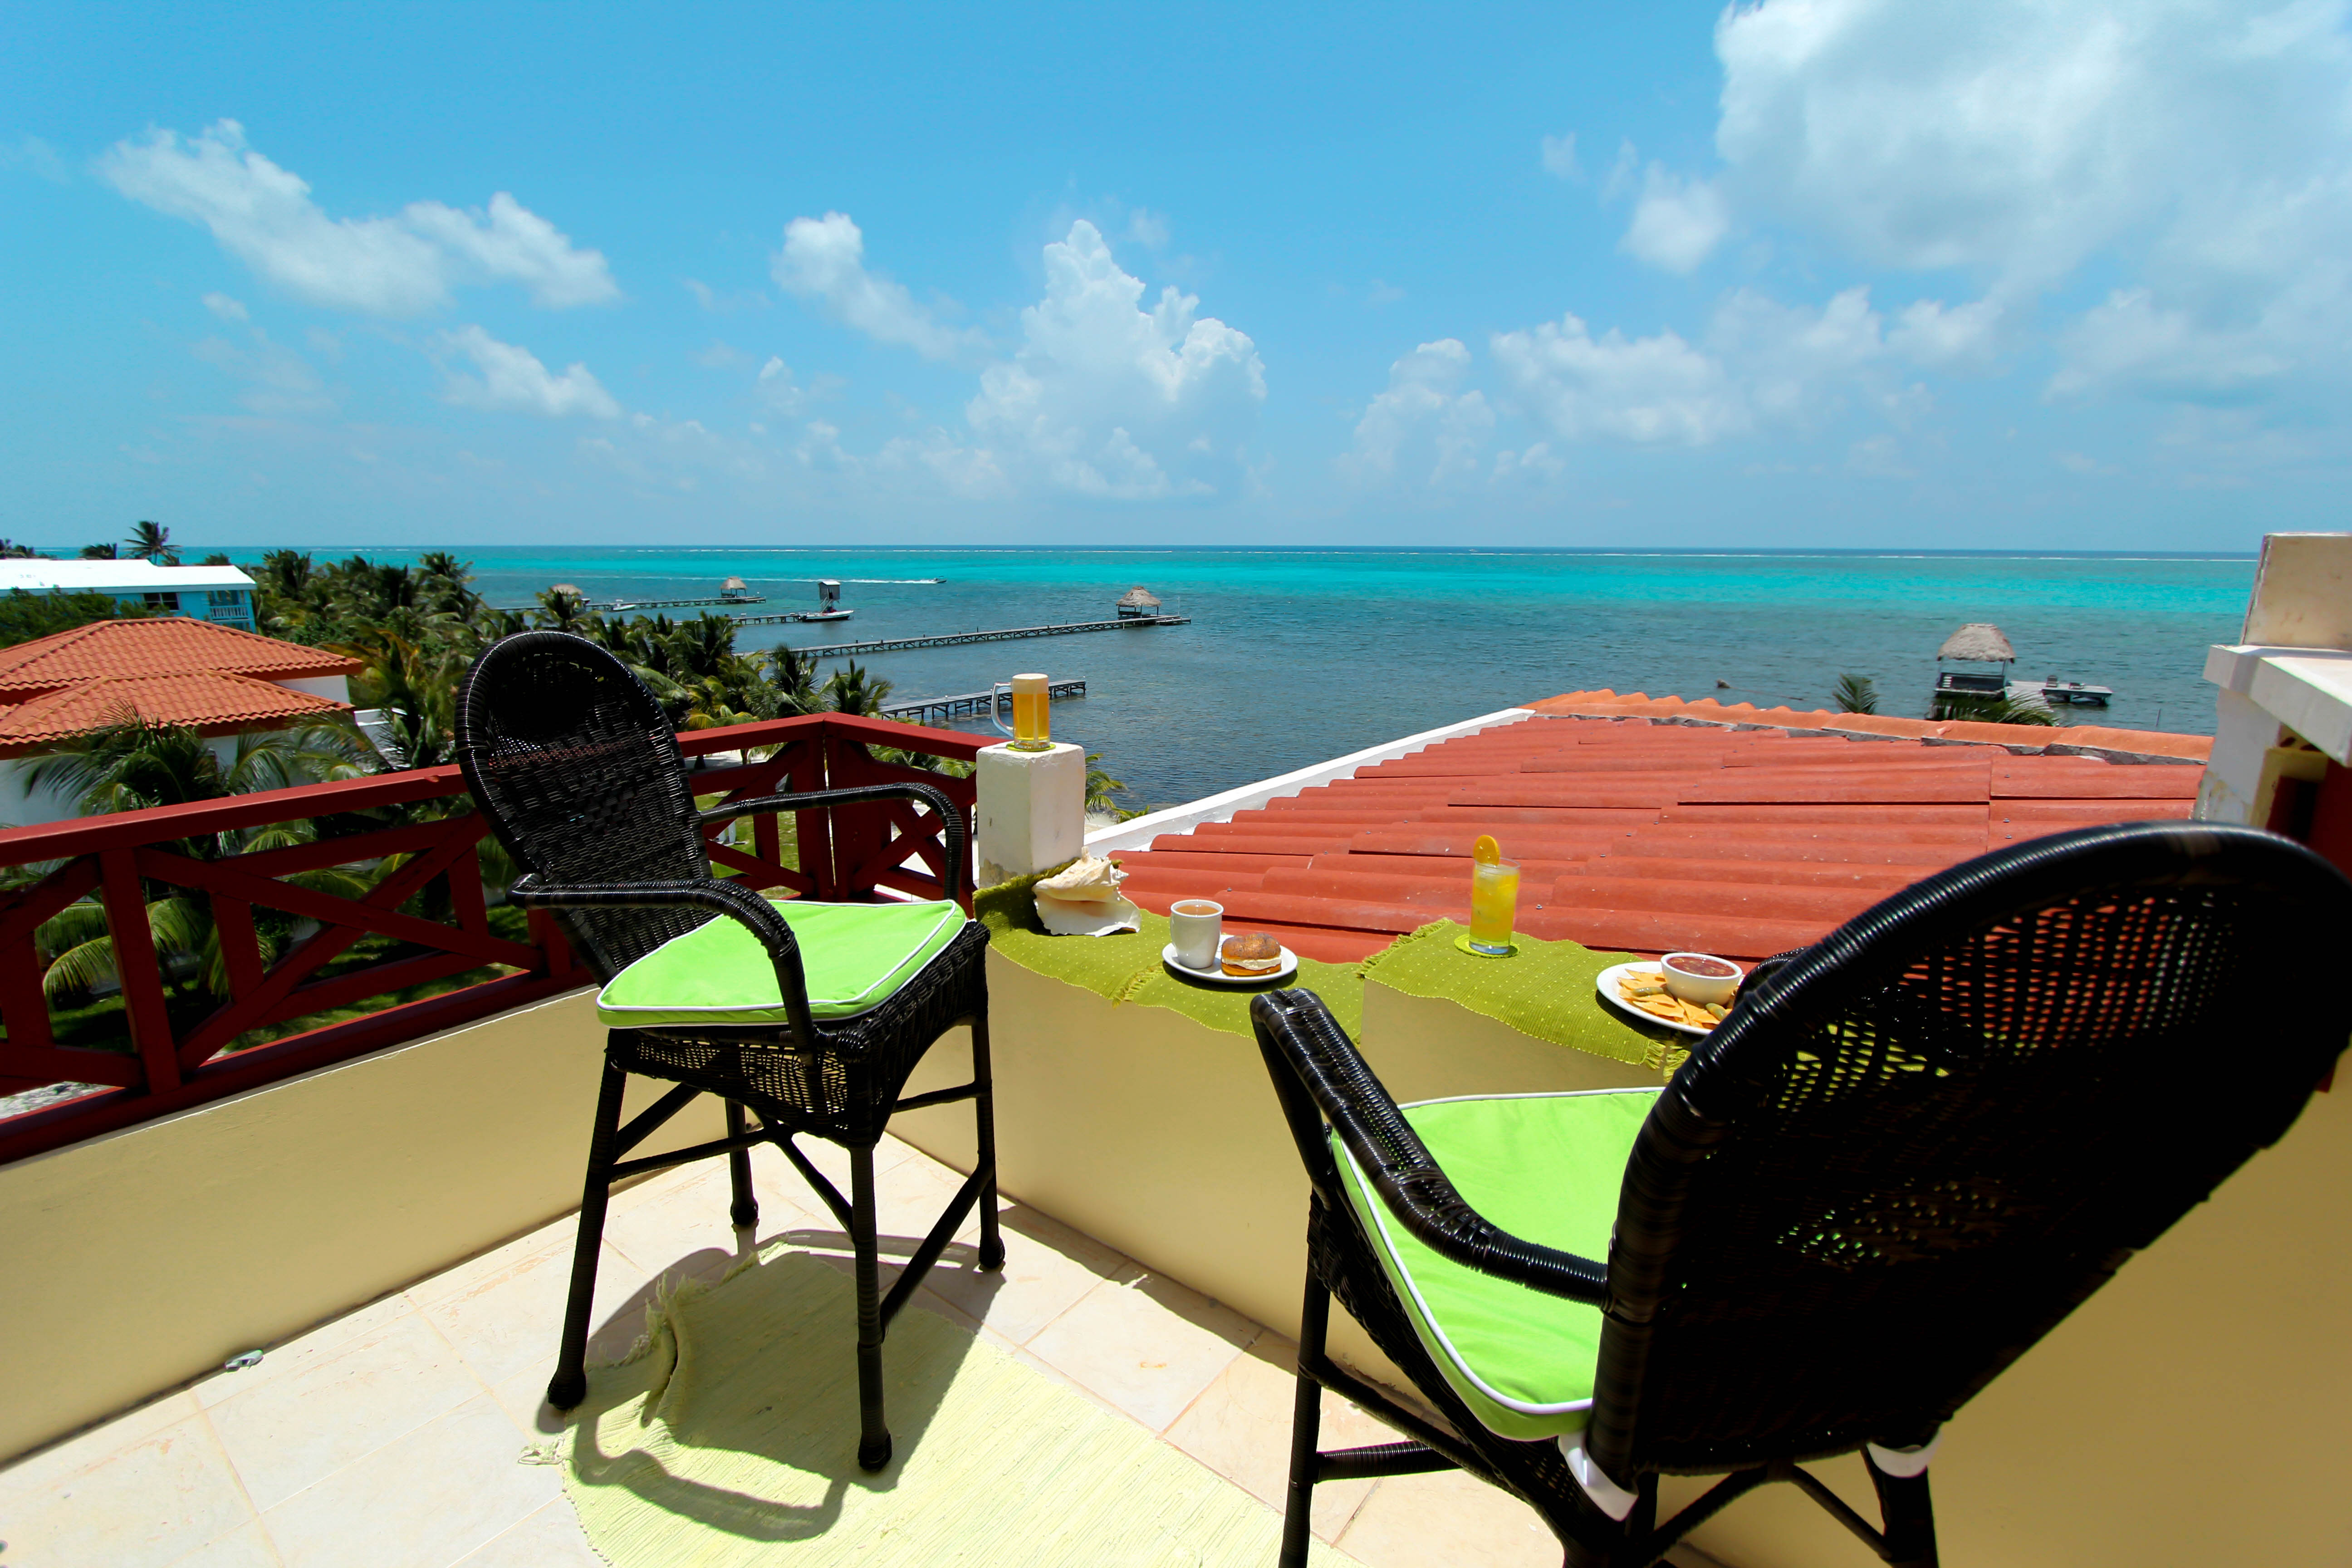 Condominium for Sale at Miramar San Pedro Town, Ambergris Caye, Belize